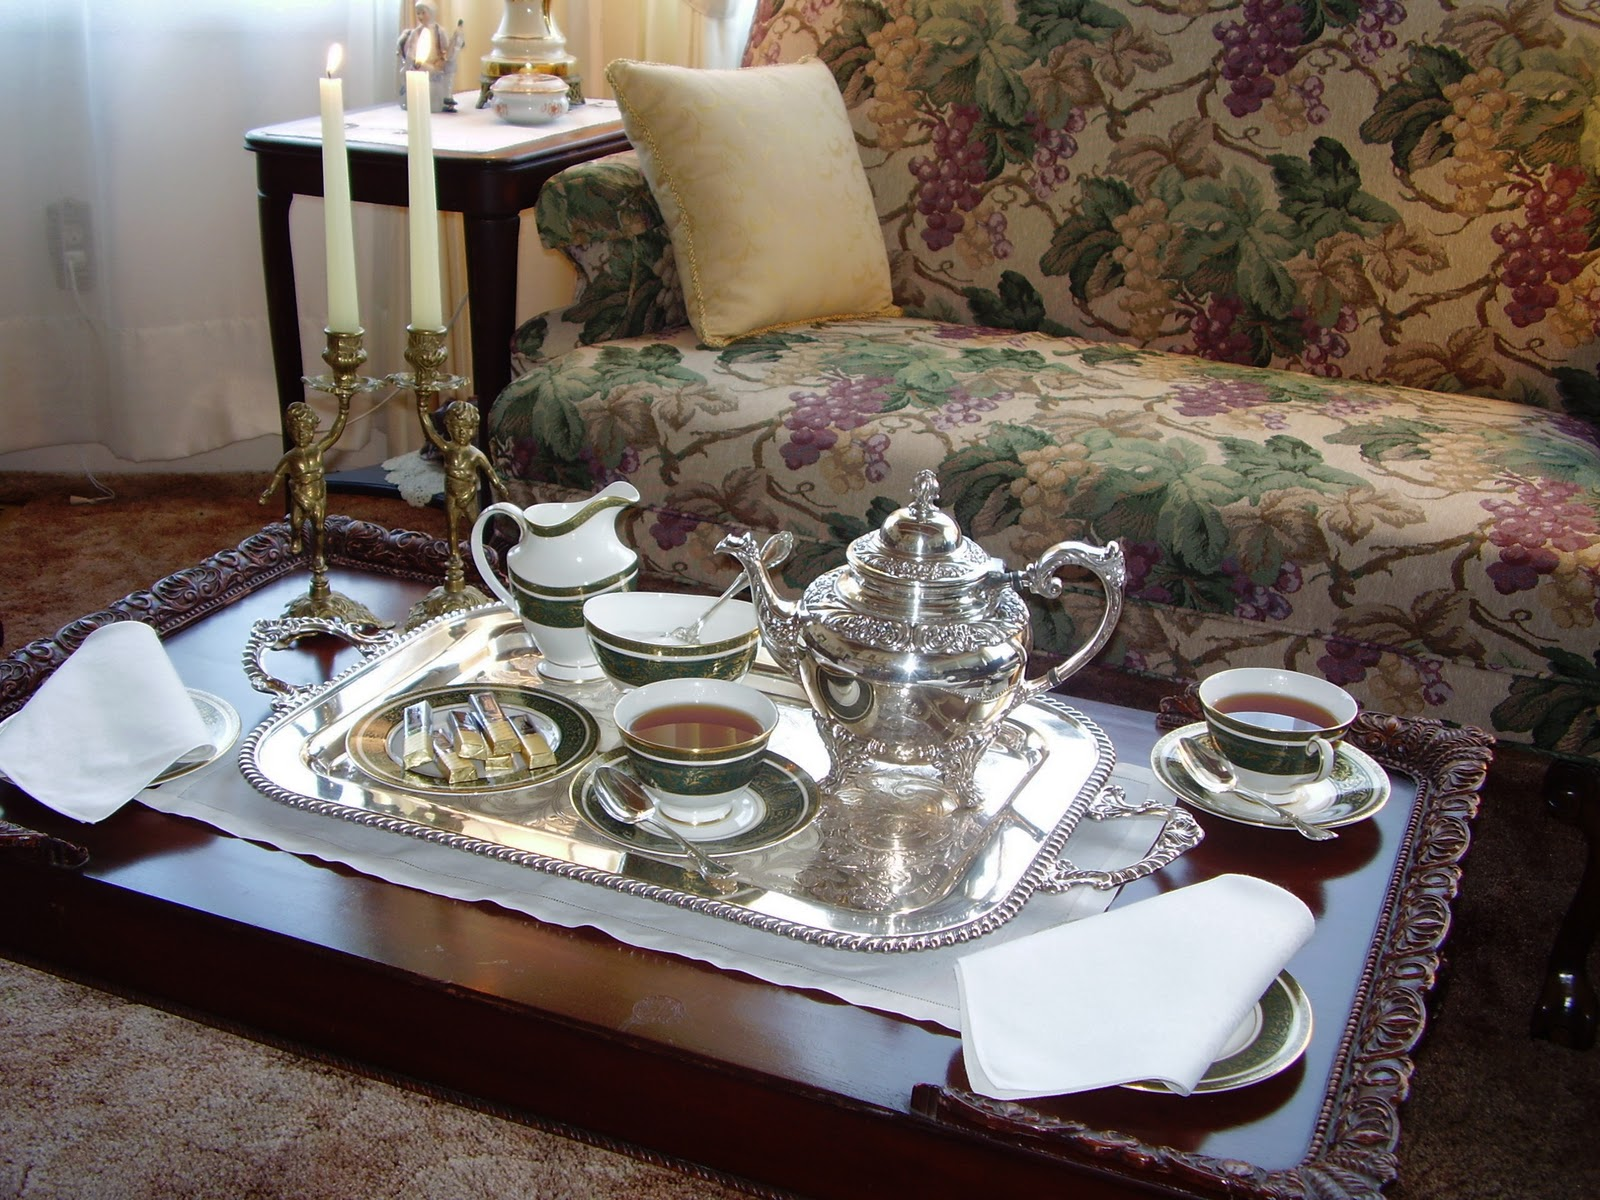 tea table settings tables - photo #6